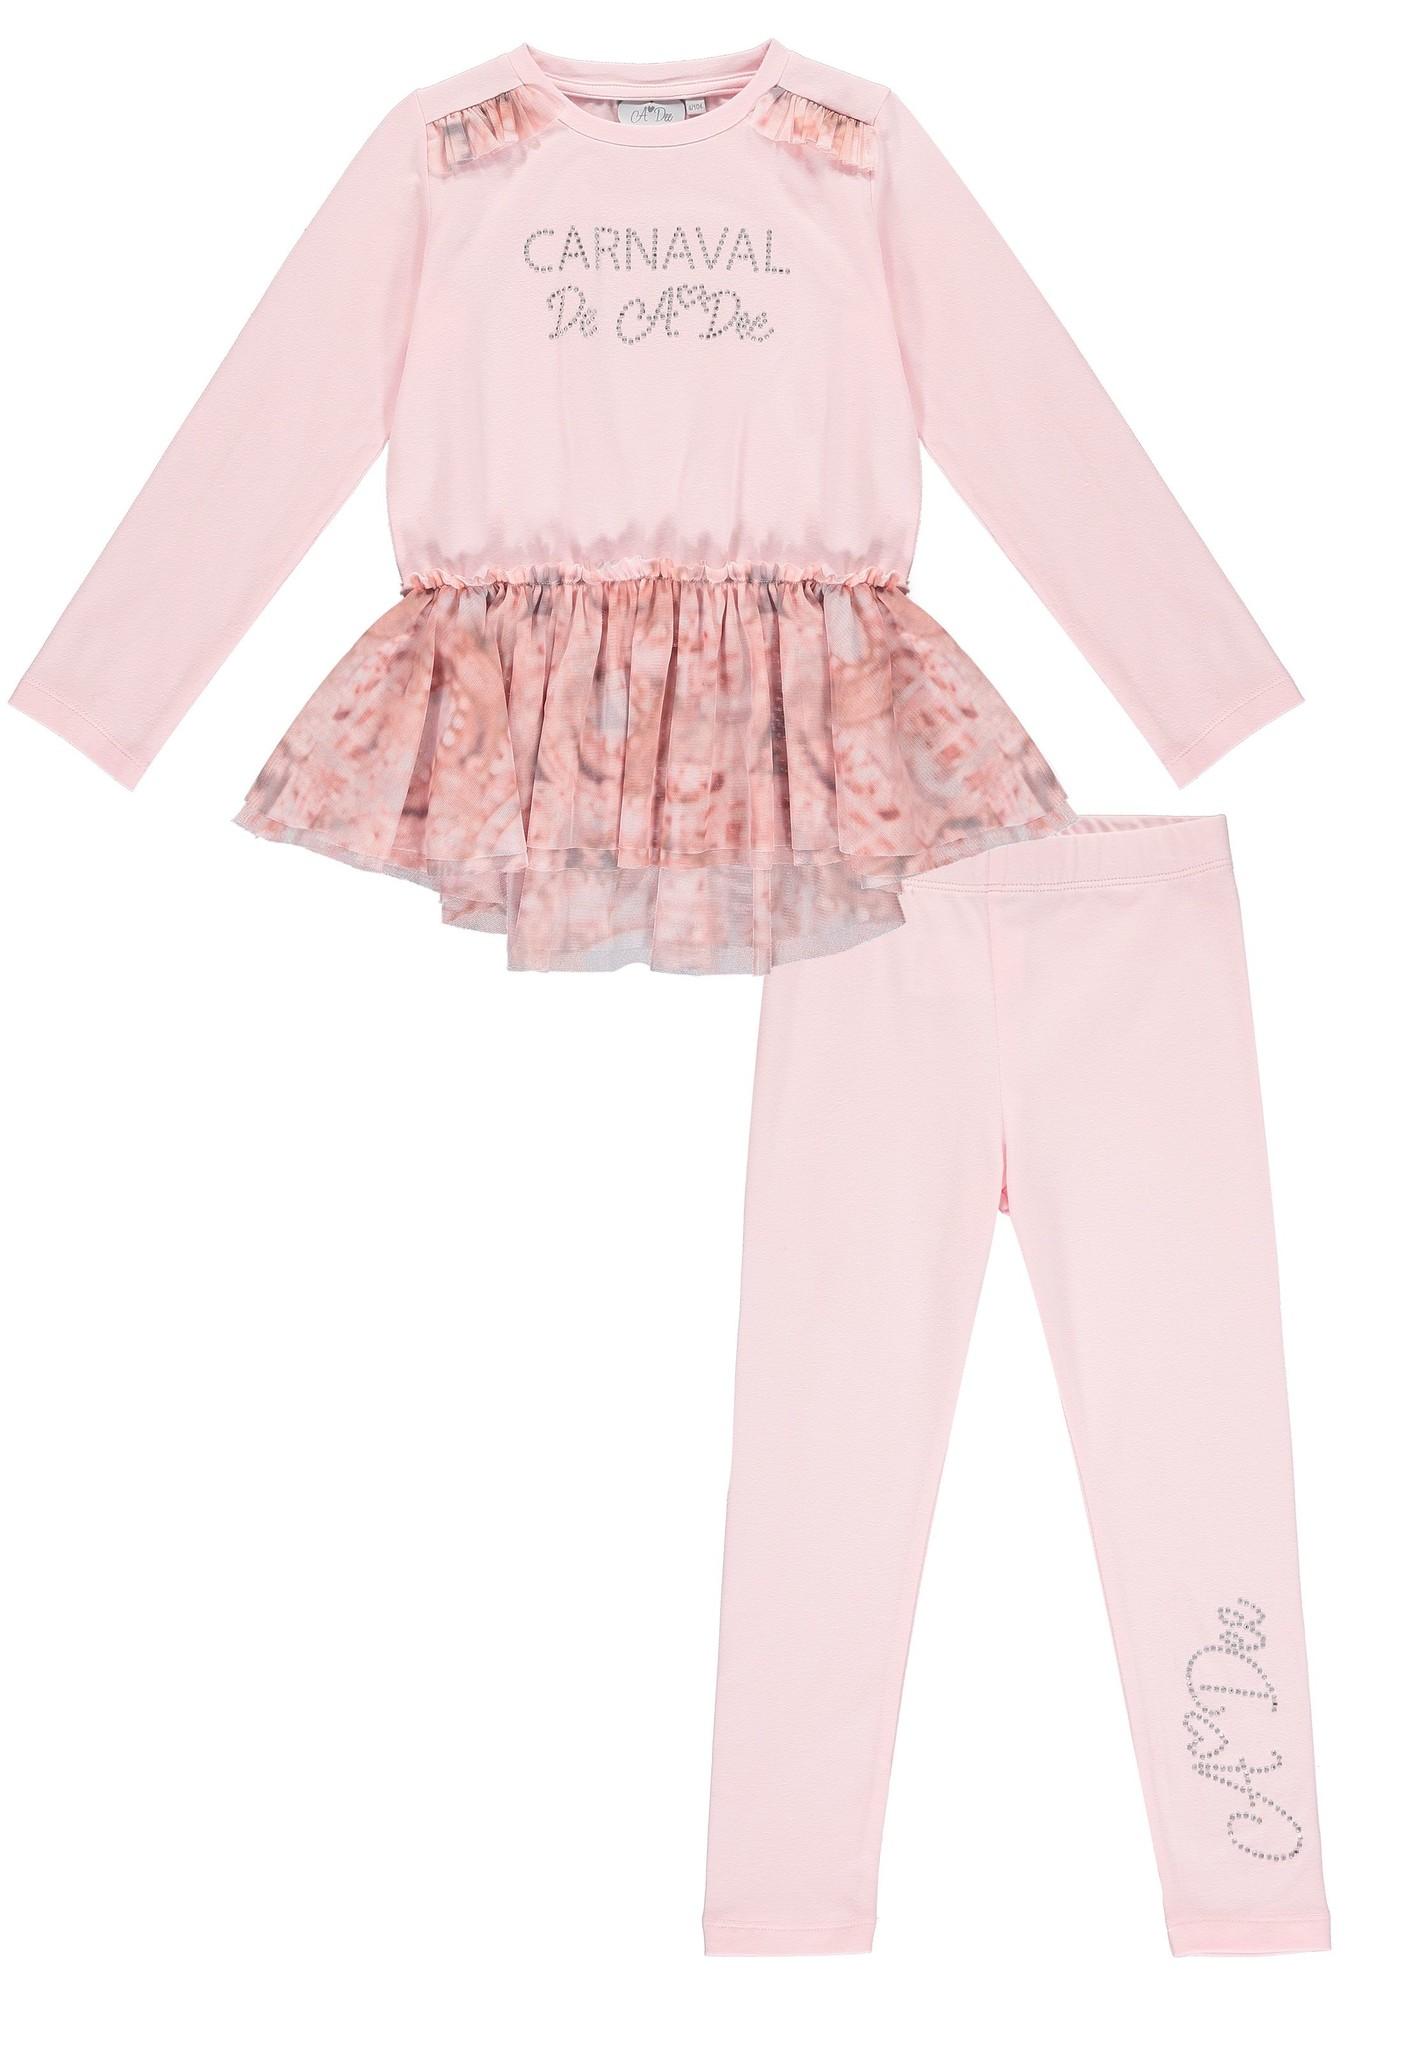 A Dee ADee Fredy Pale Pink Carnival Legging Set